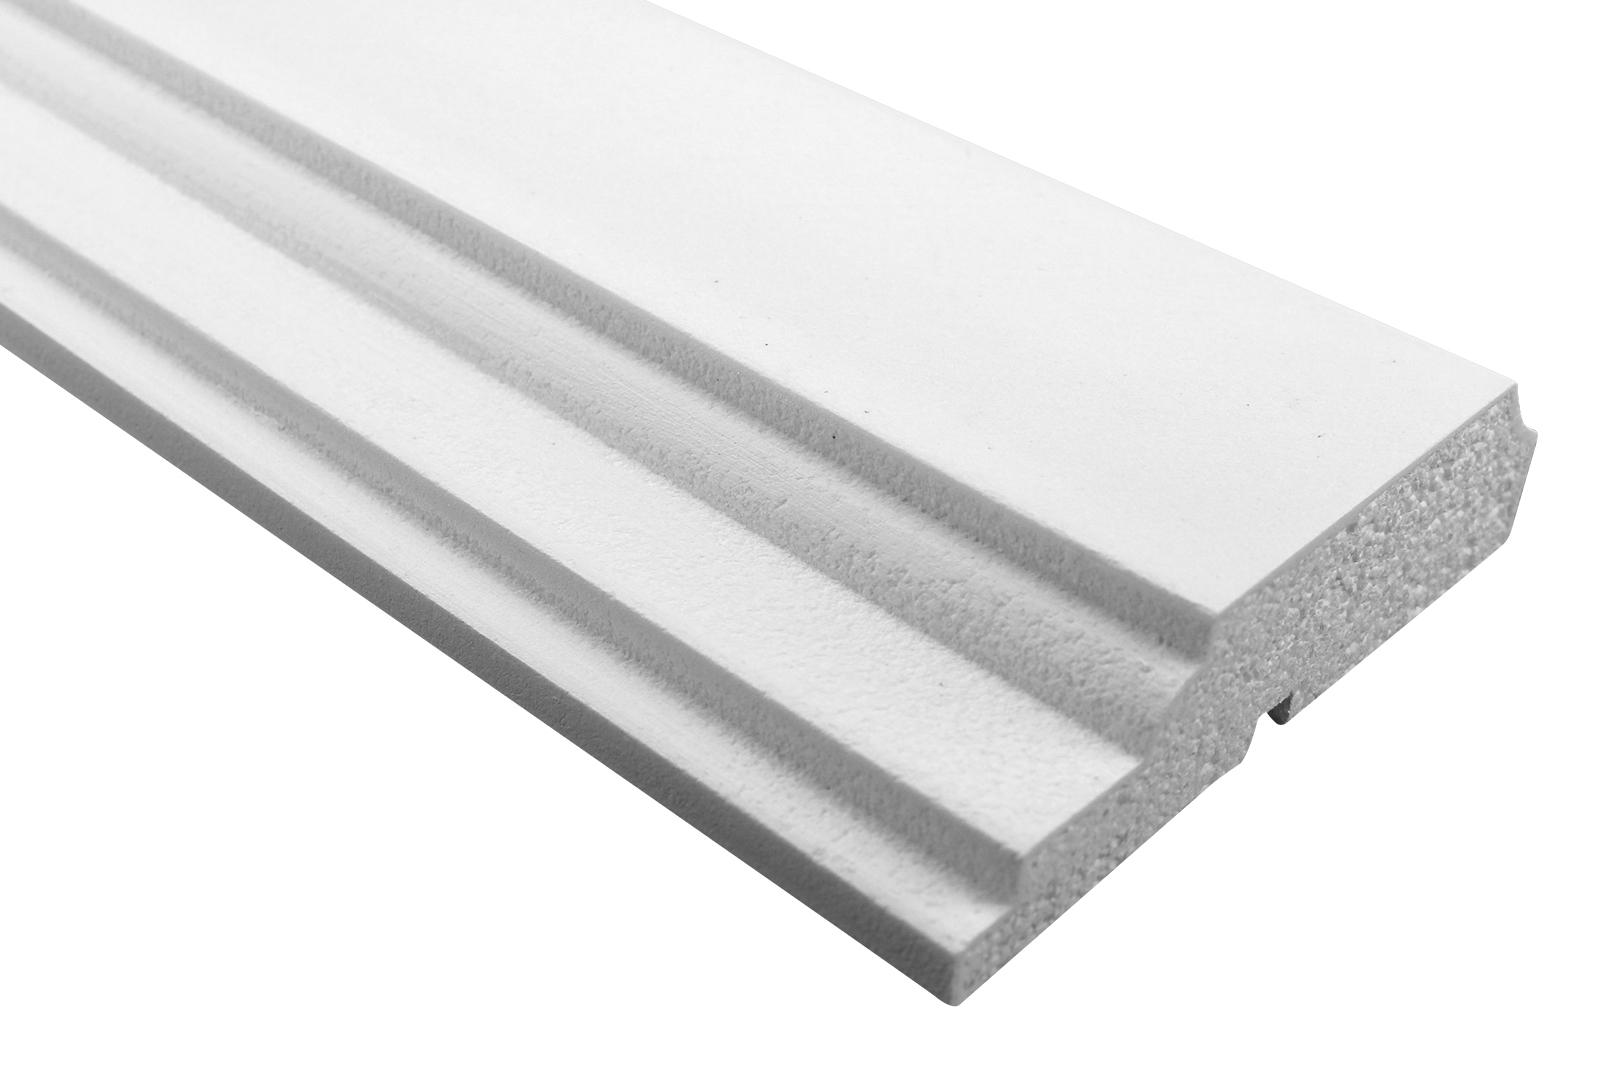 Fassade | Profile mit Ausprägung | EPS | PU |stoßfest |45x170mm | MC167